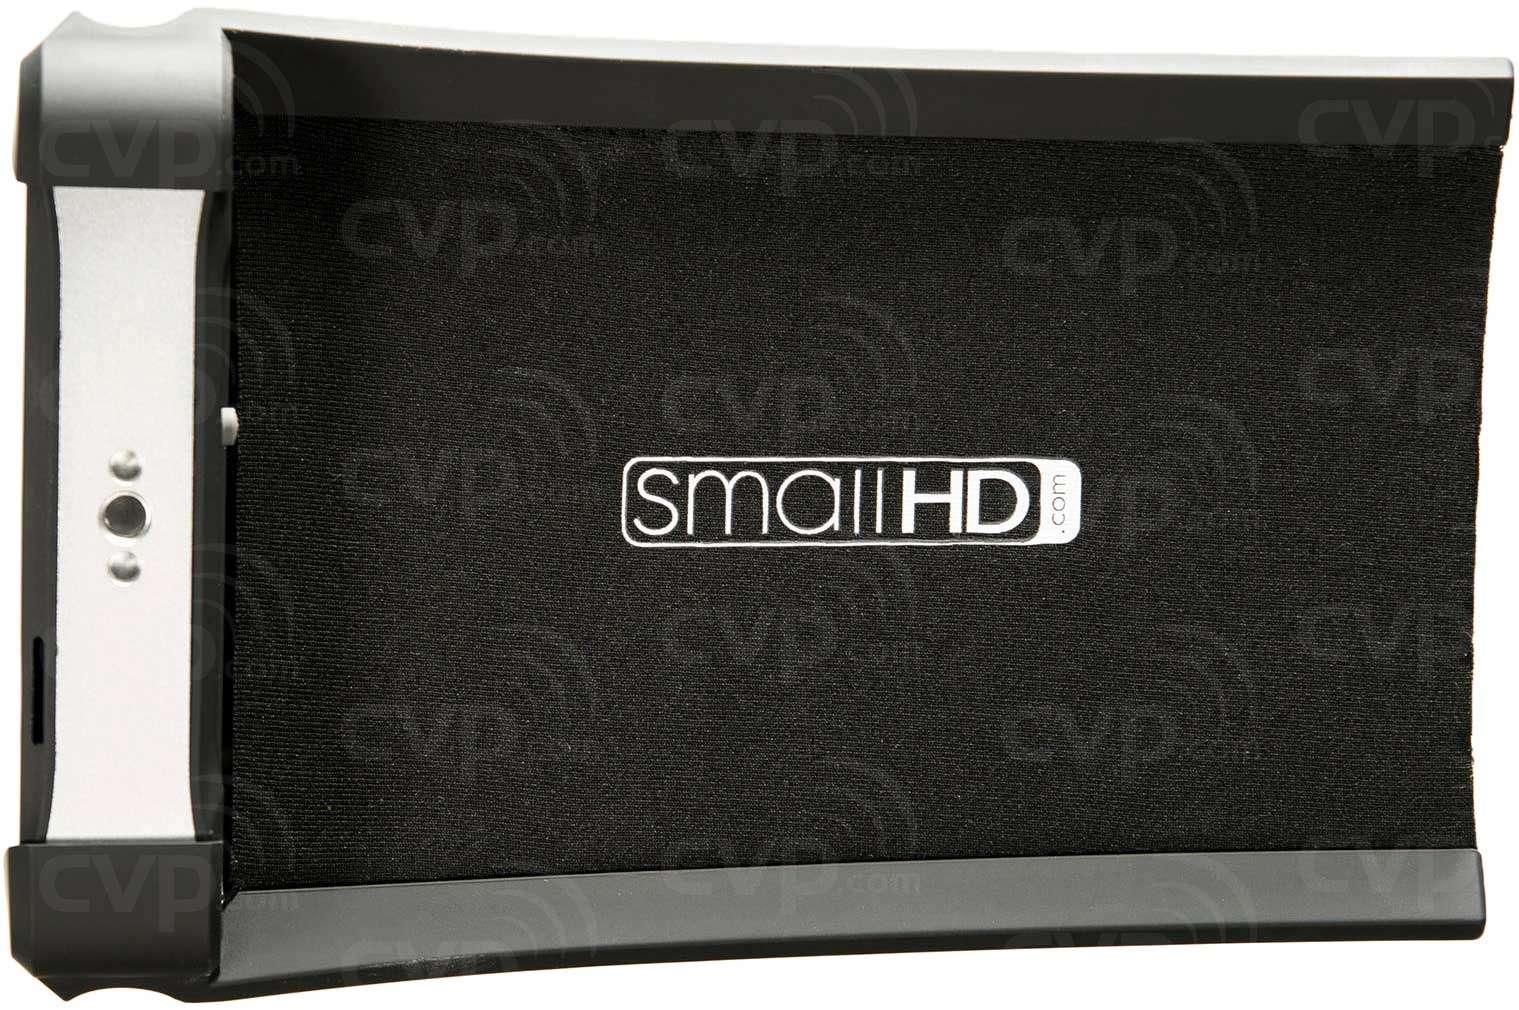 Small HD ACC-HOOD-700 (ACCHOOD700) Sun Hood for 700 Series Field